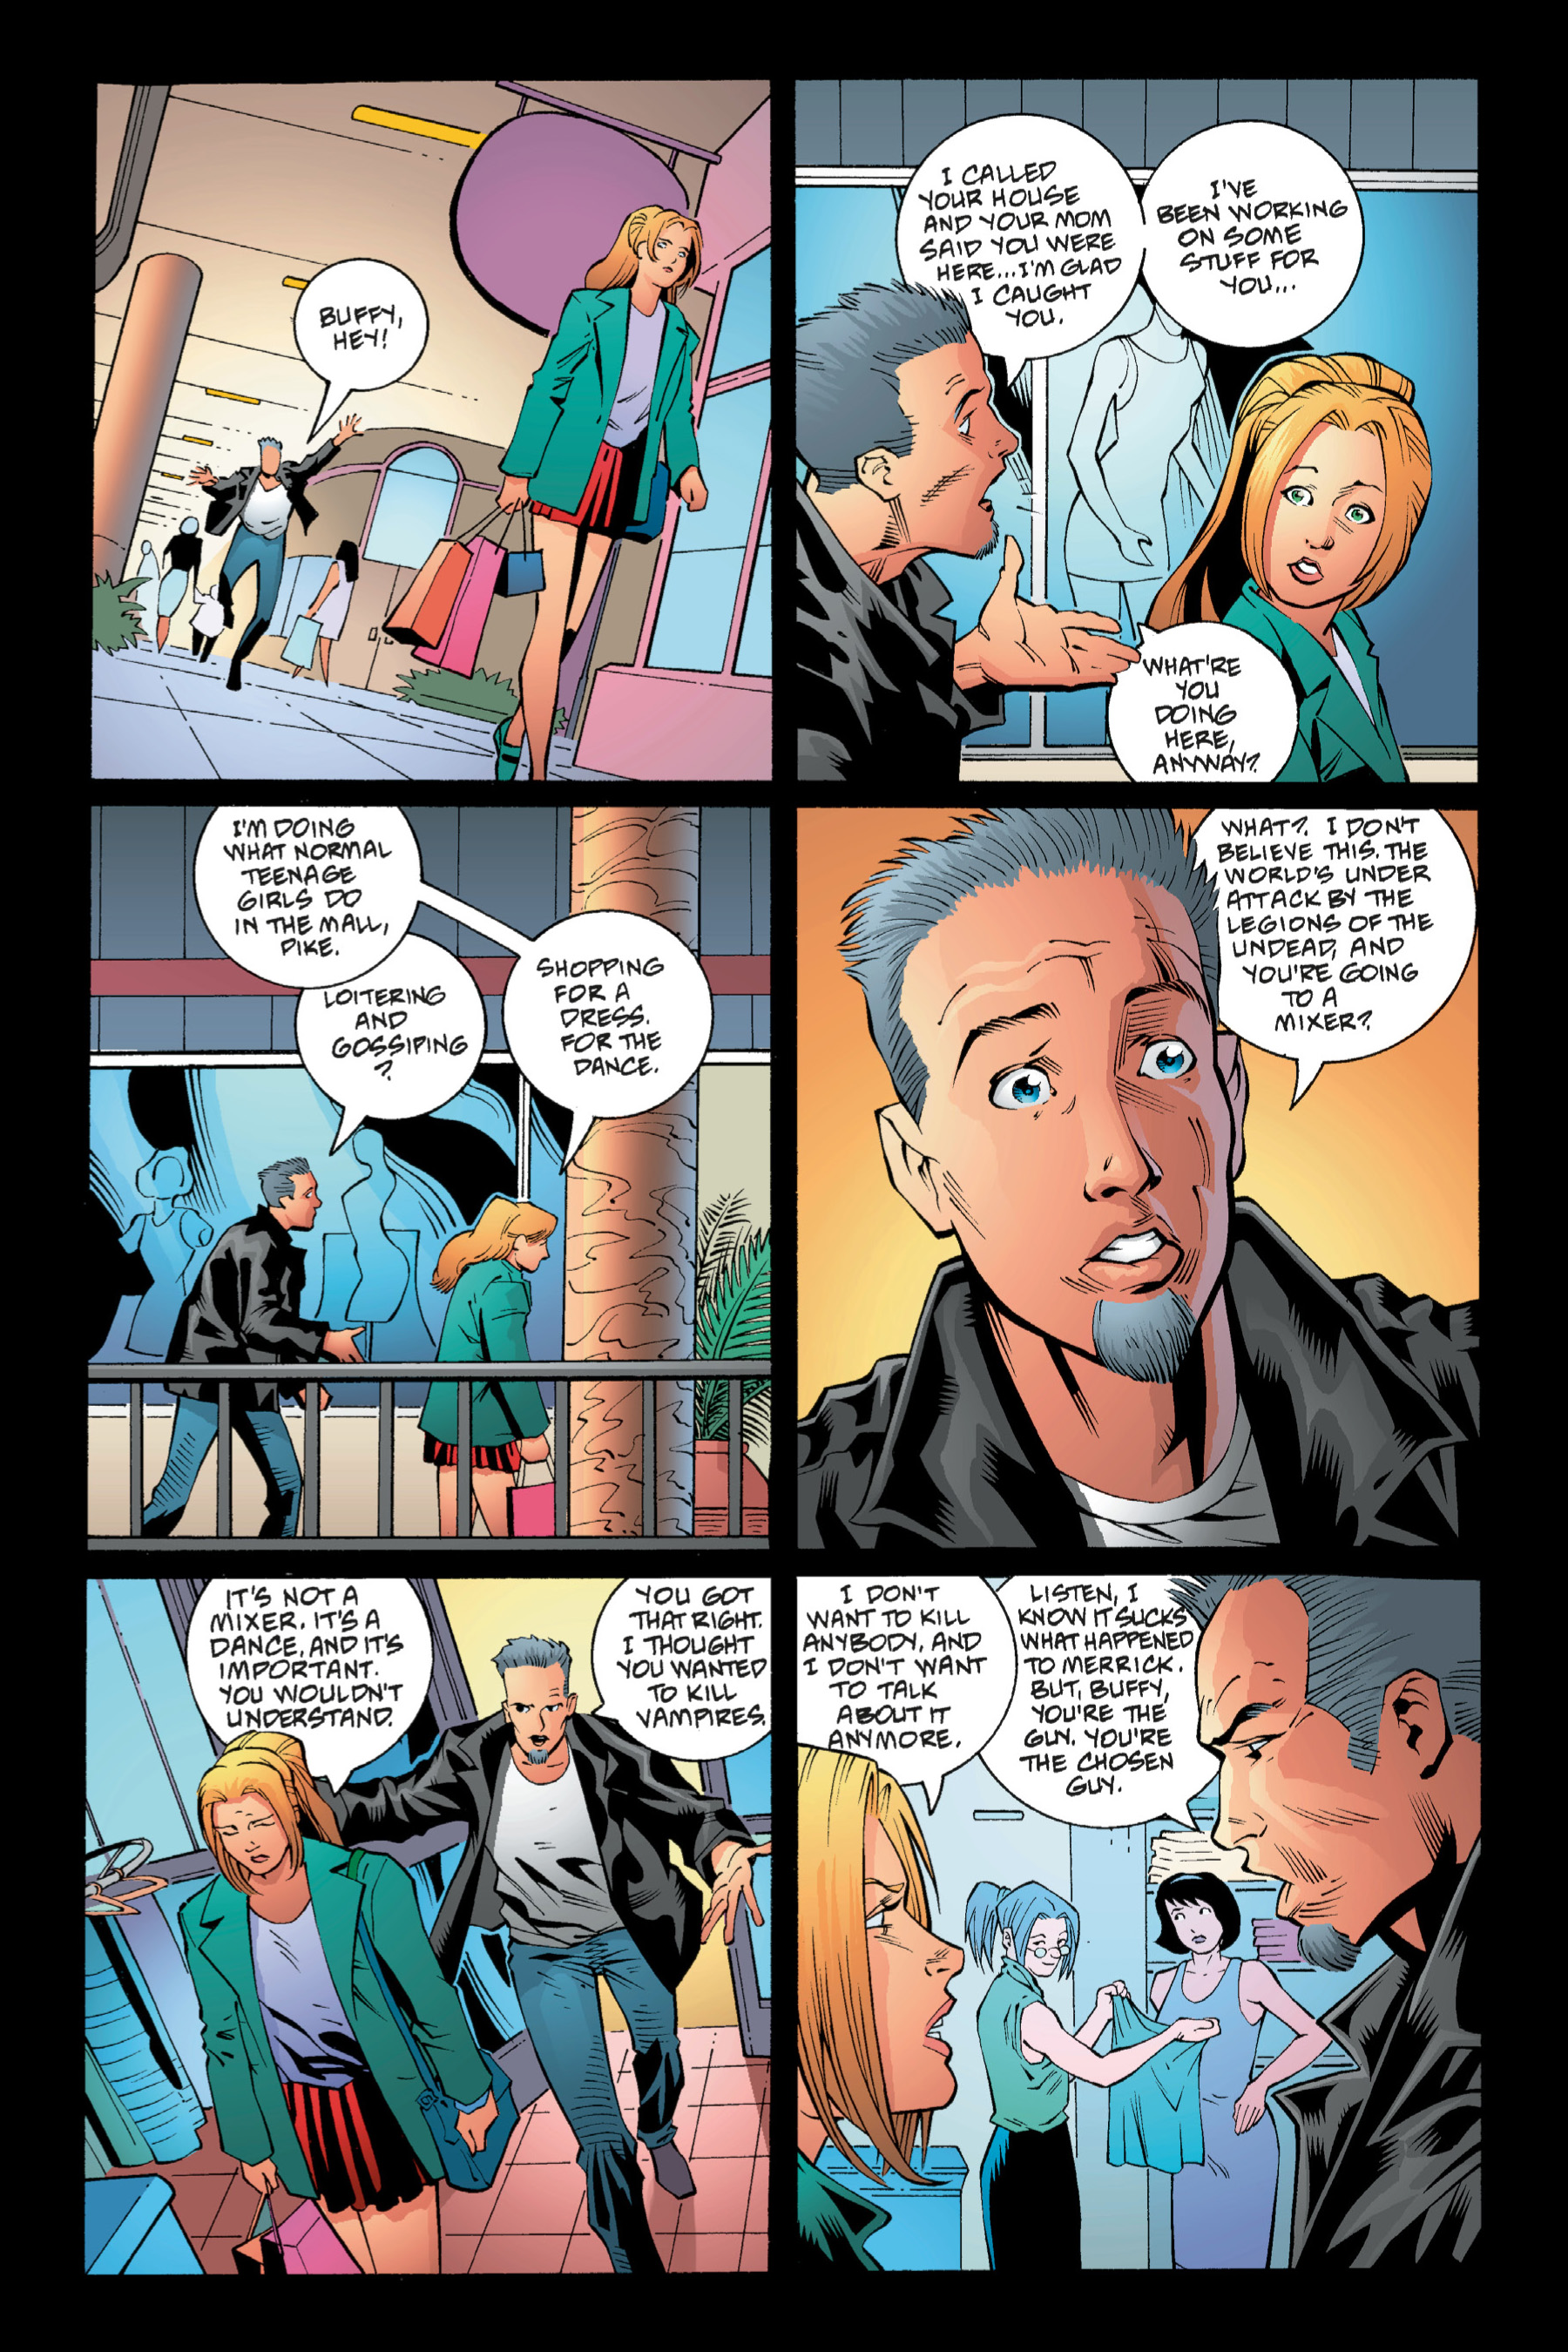 Read online Buffy the Vampire Slayer: Omnibus comic -  Issue # TPB 1 - 84